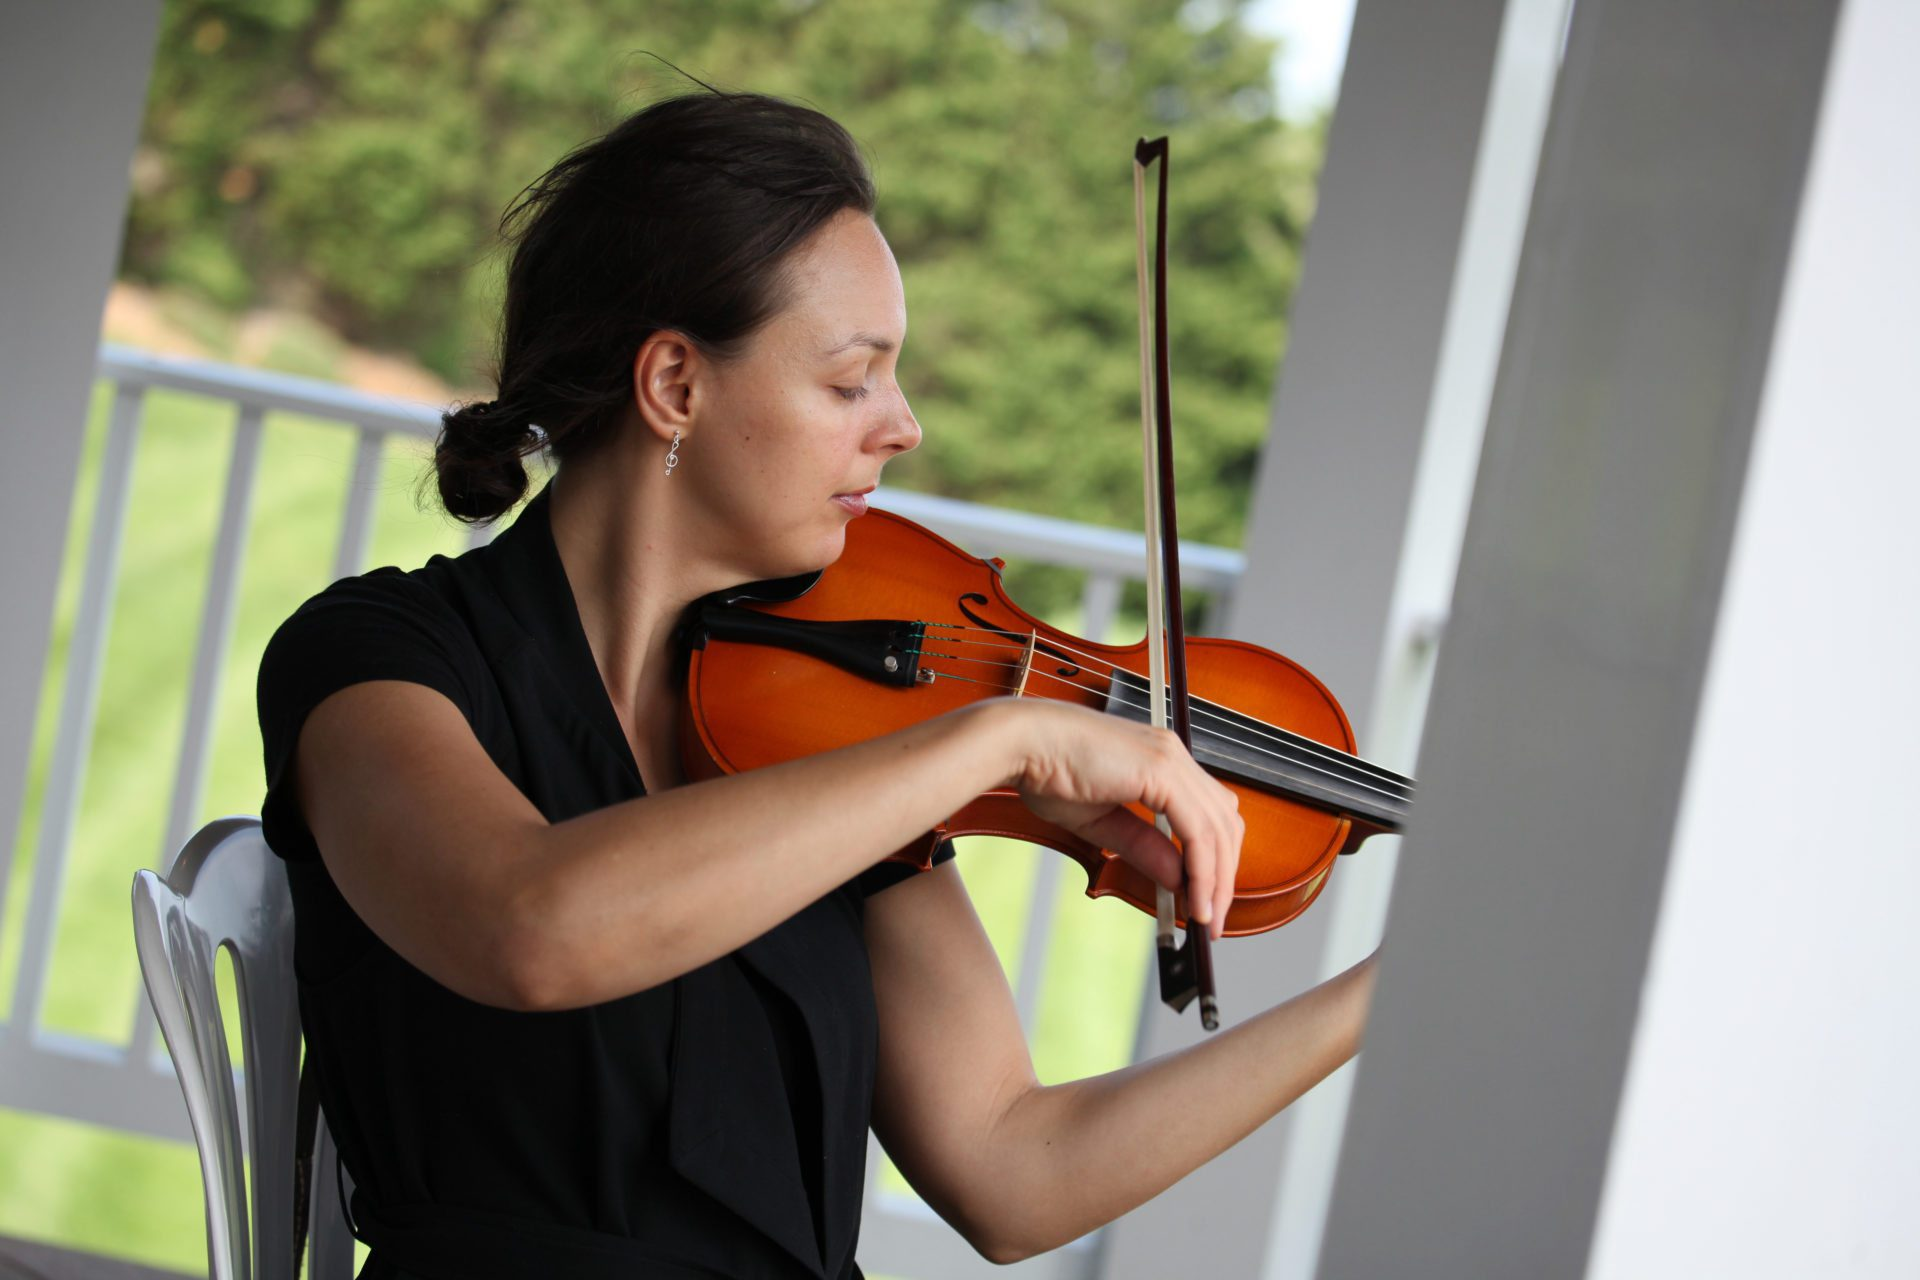 Violin plays before wedding ceremony